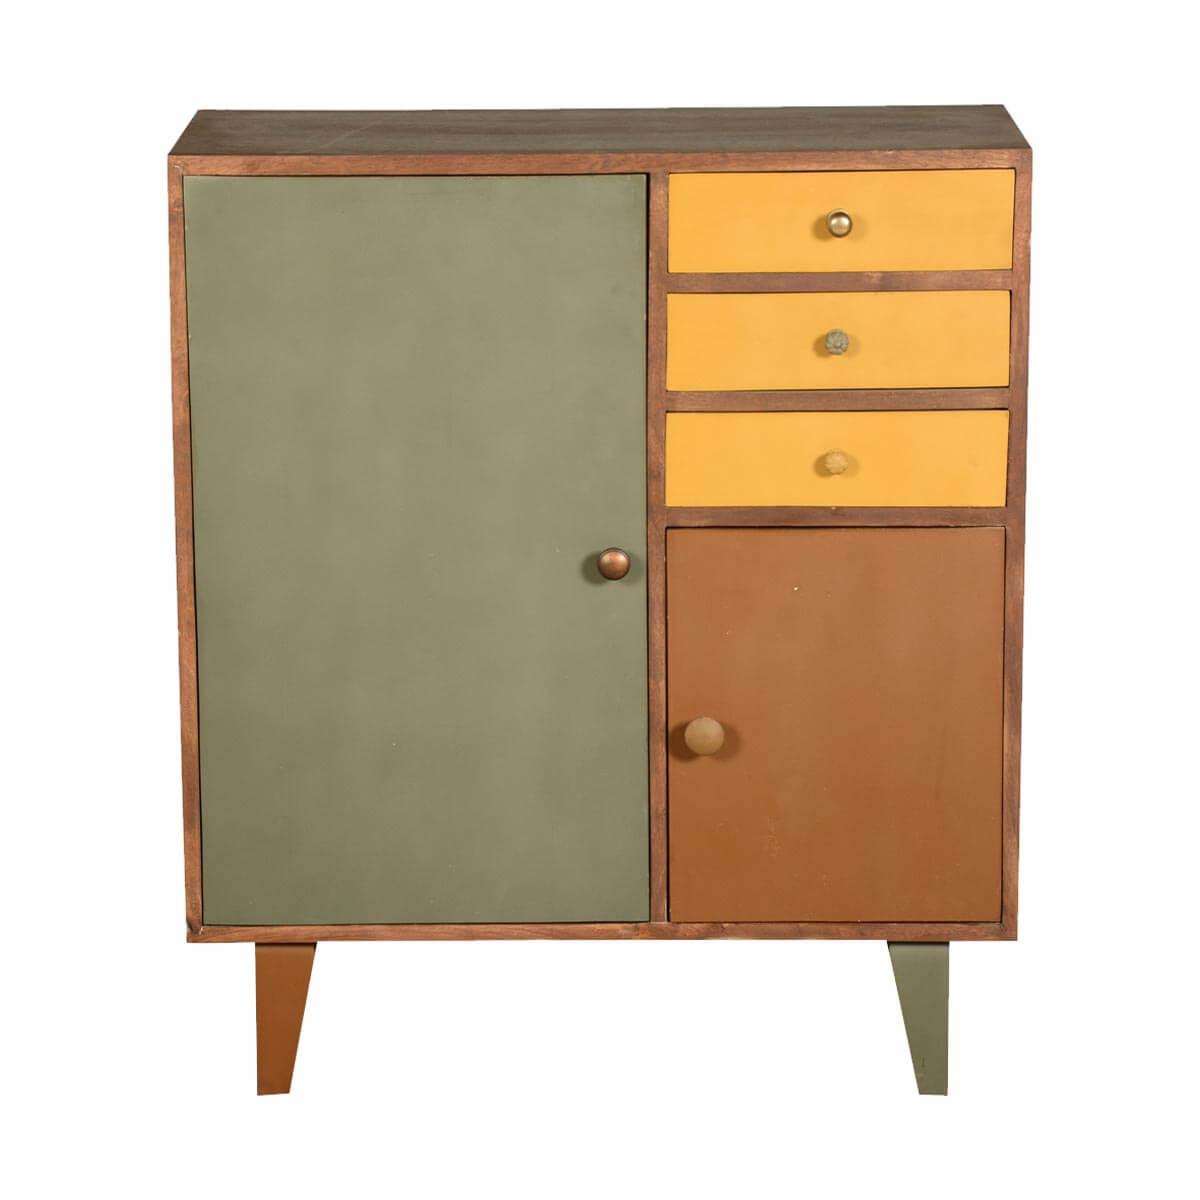 Wood Storage Cabinets: Smyrna 60's Retro Mango Wood 3 Drawer Freestanding Storage